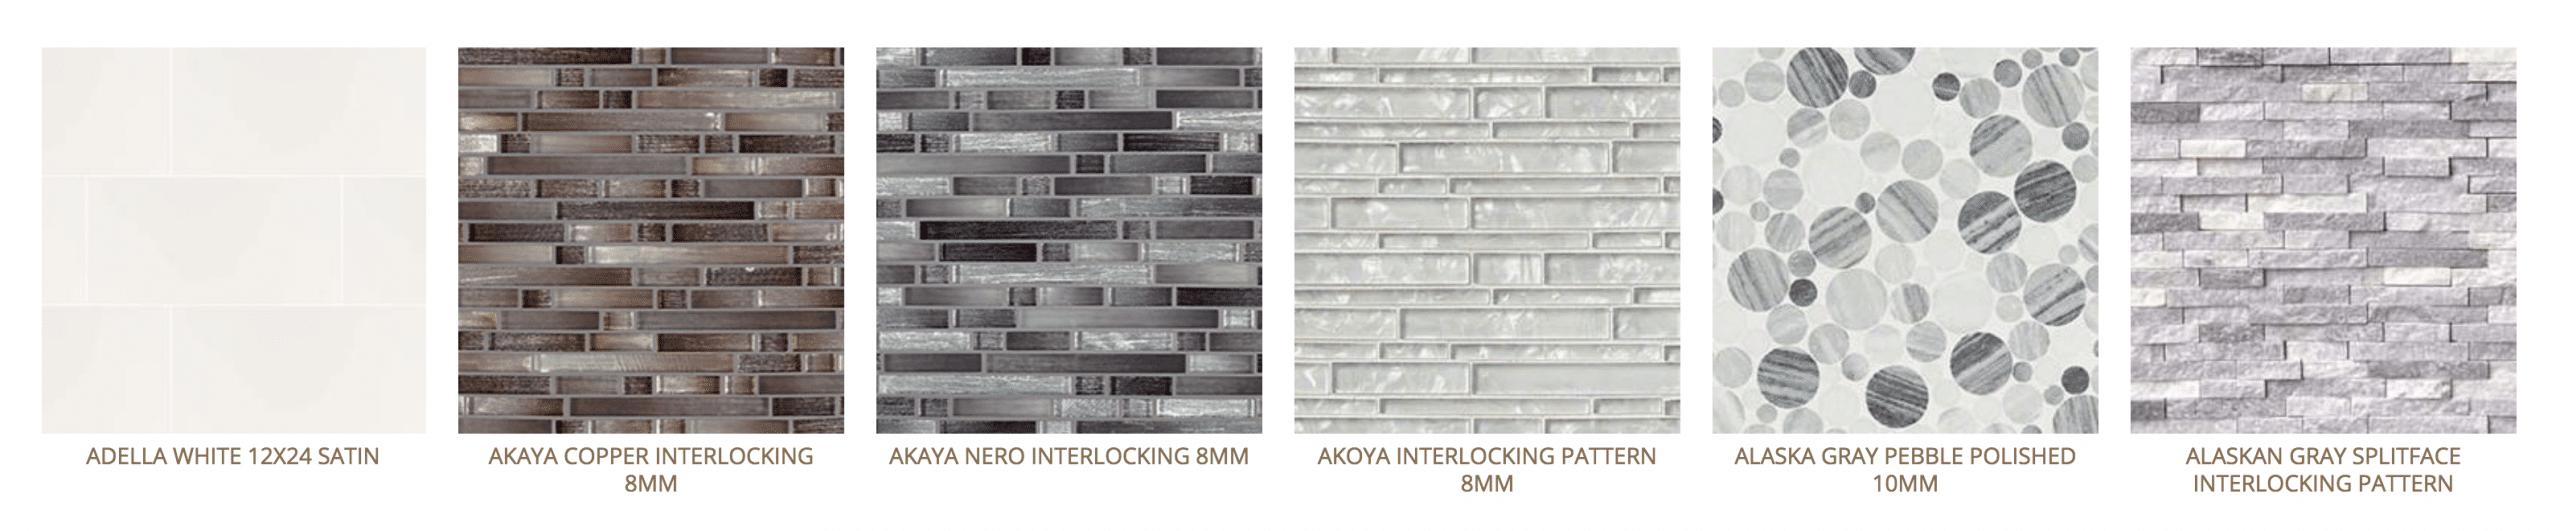 various backsplash tiles